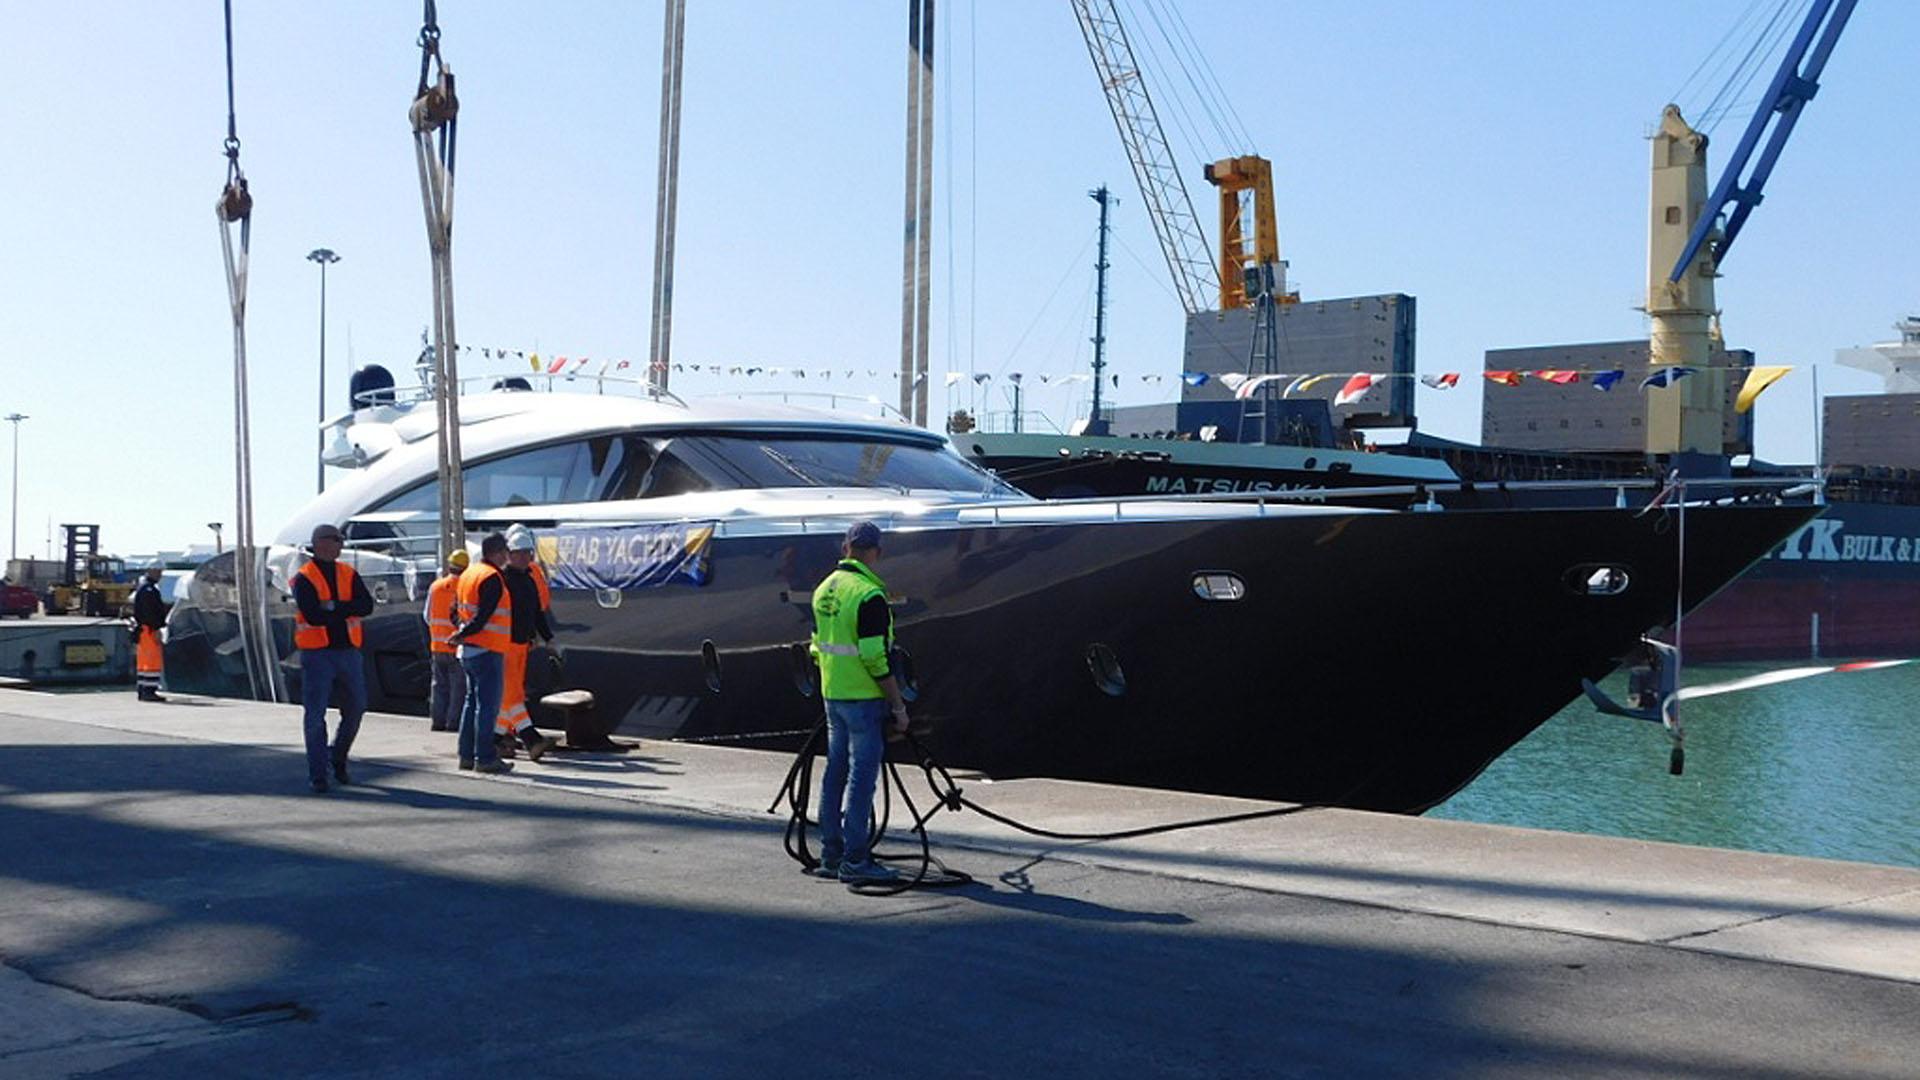 ab-100-motor-yacht-2016-30m-profile-christening